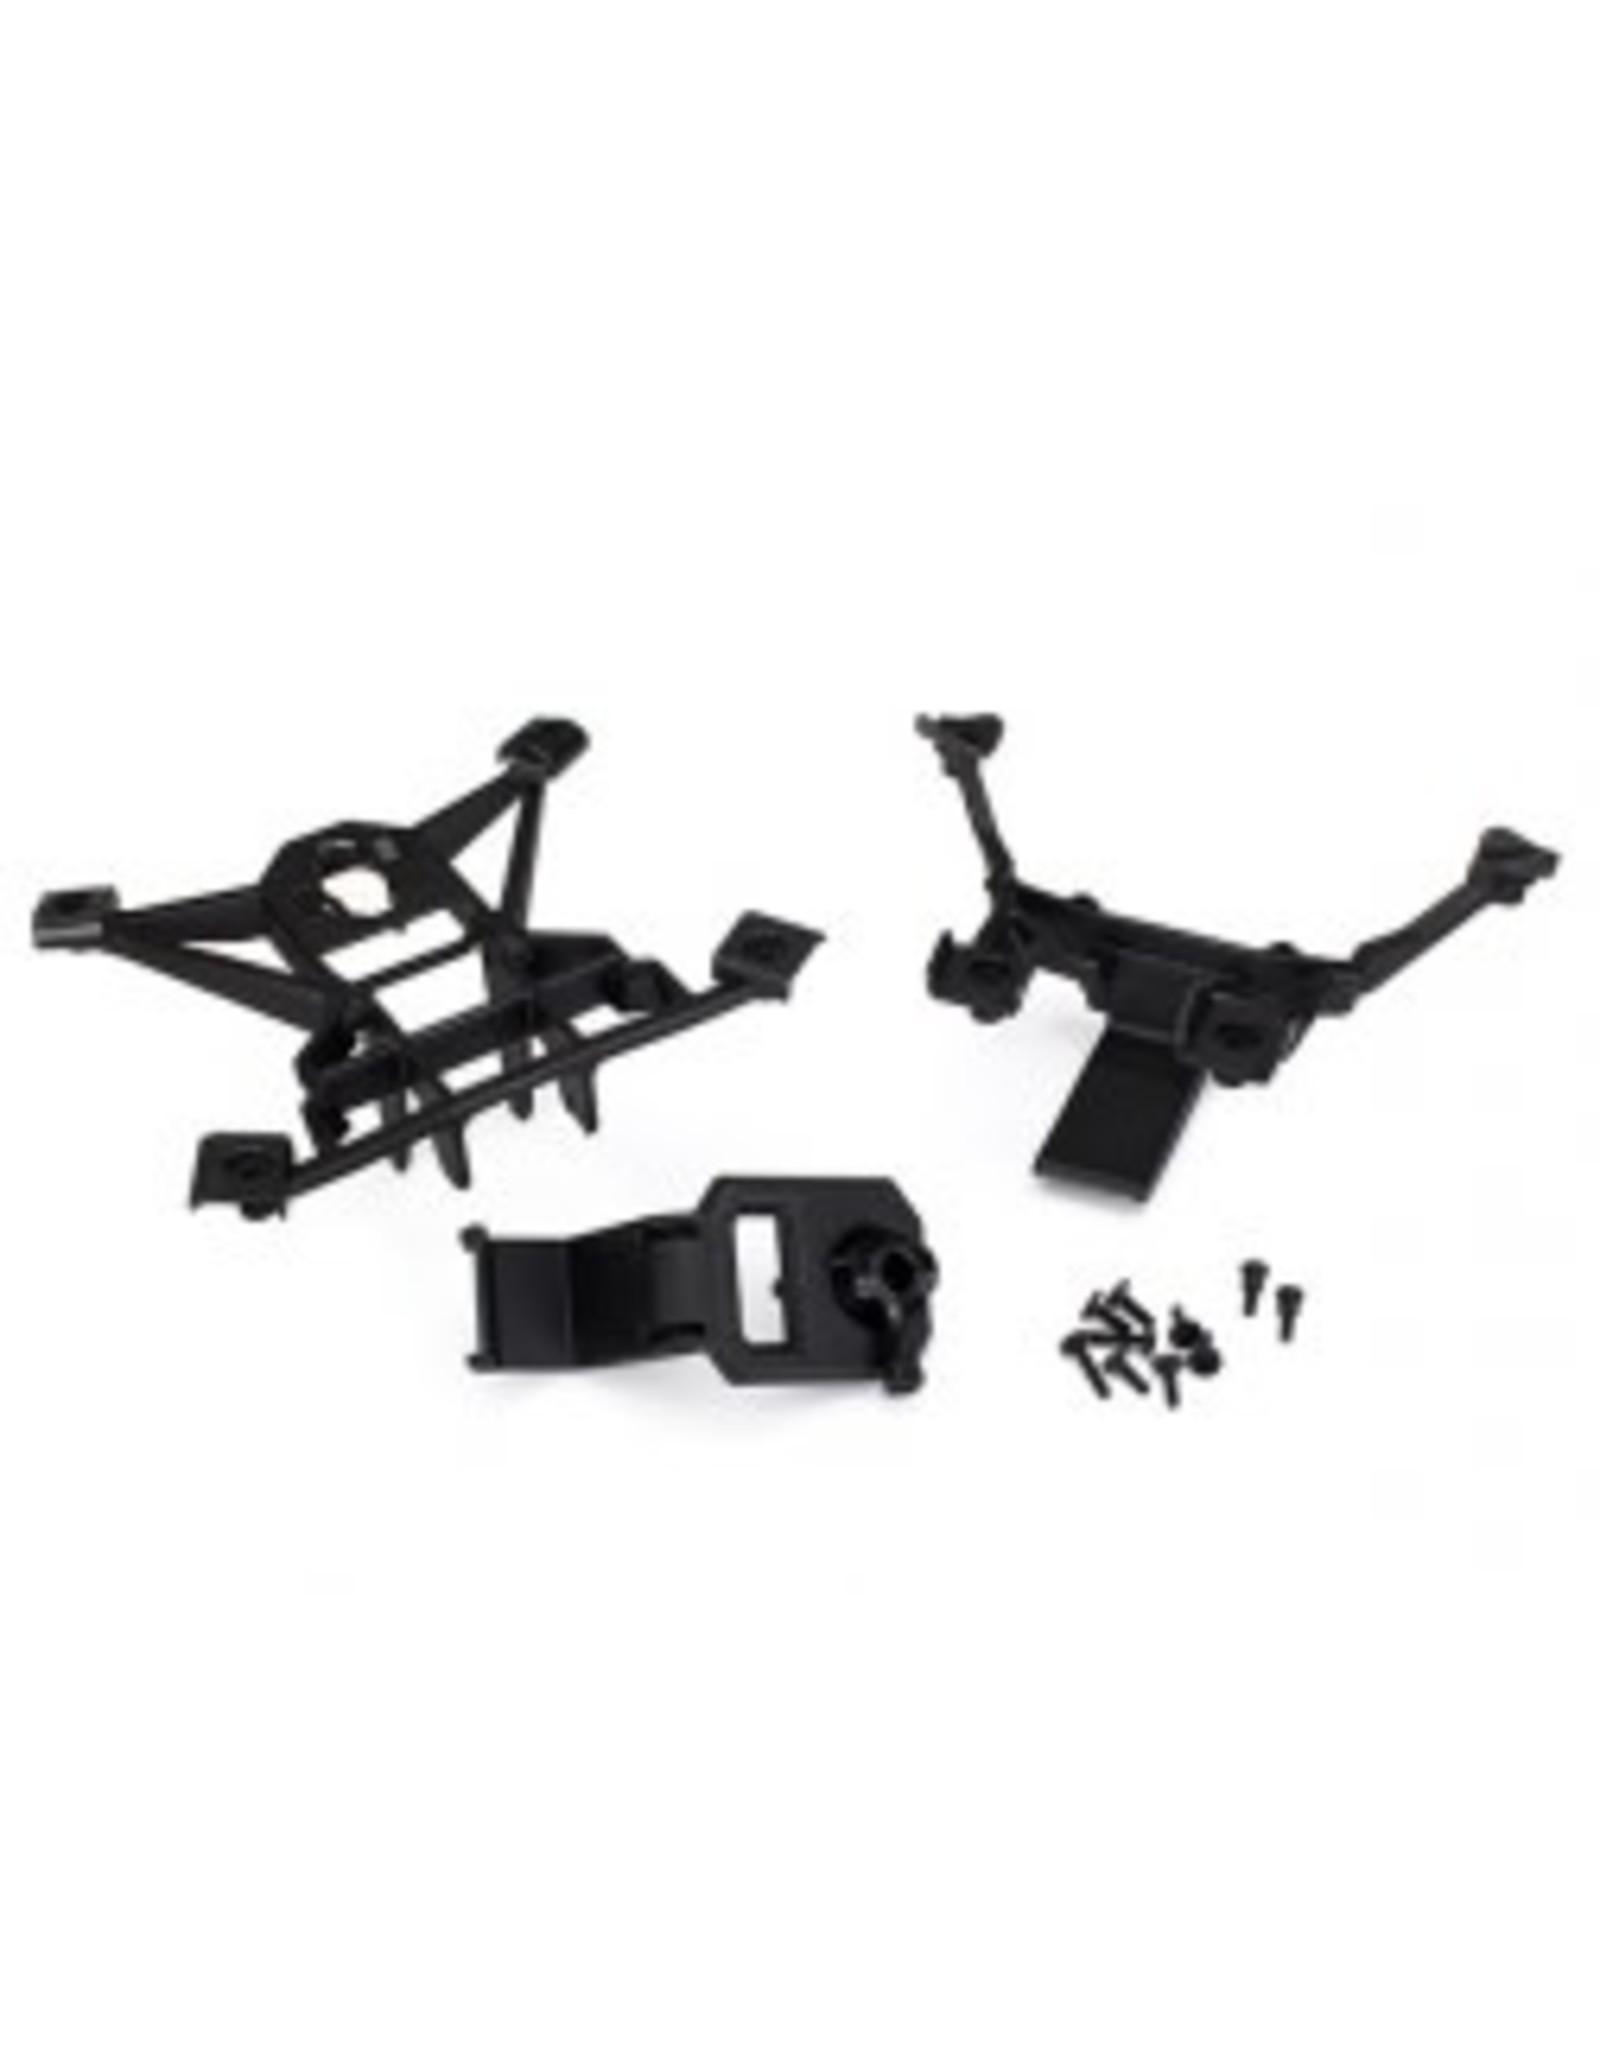 Traxxas Body mounts, front & rear/3x15mm BCS (1)/ 3x12mm shoulder screw (2)/ 3x10mm flat-head machine screw (6)/ 3x15mm flat-head machine screw (2)